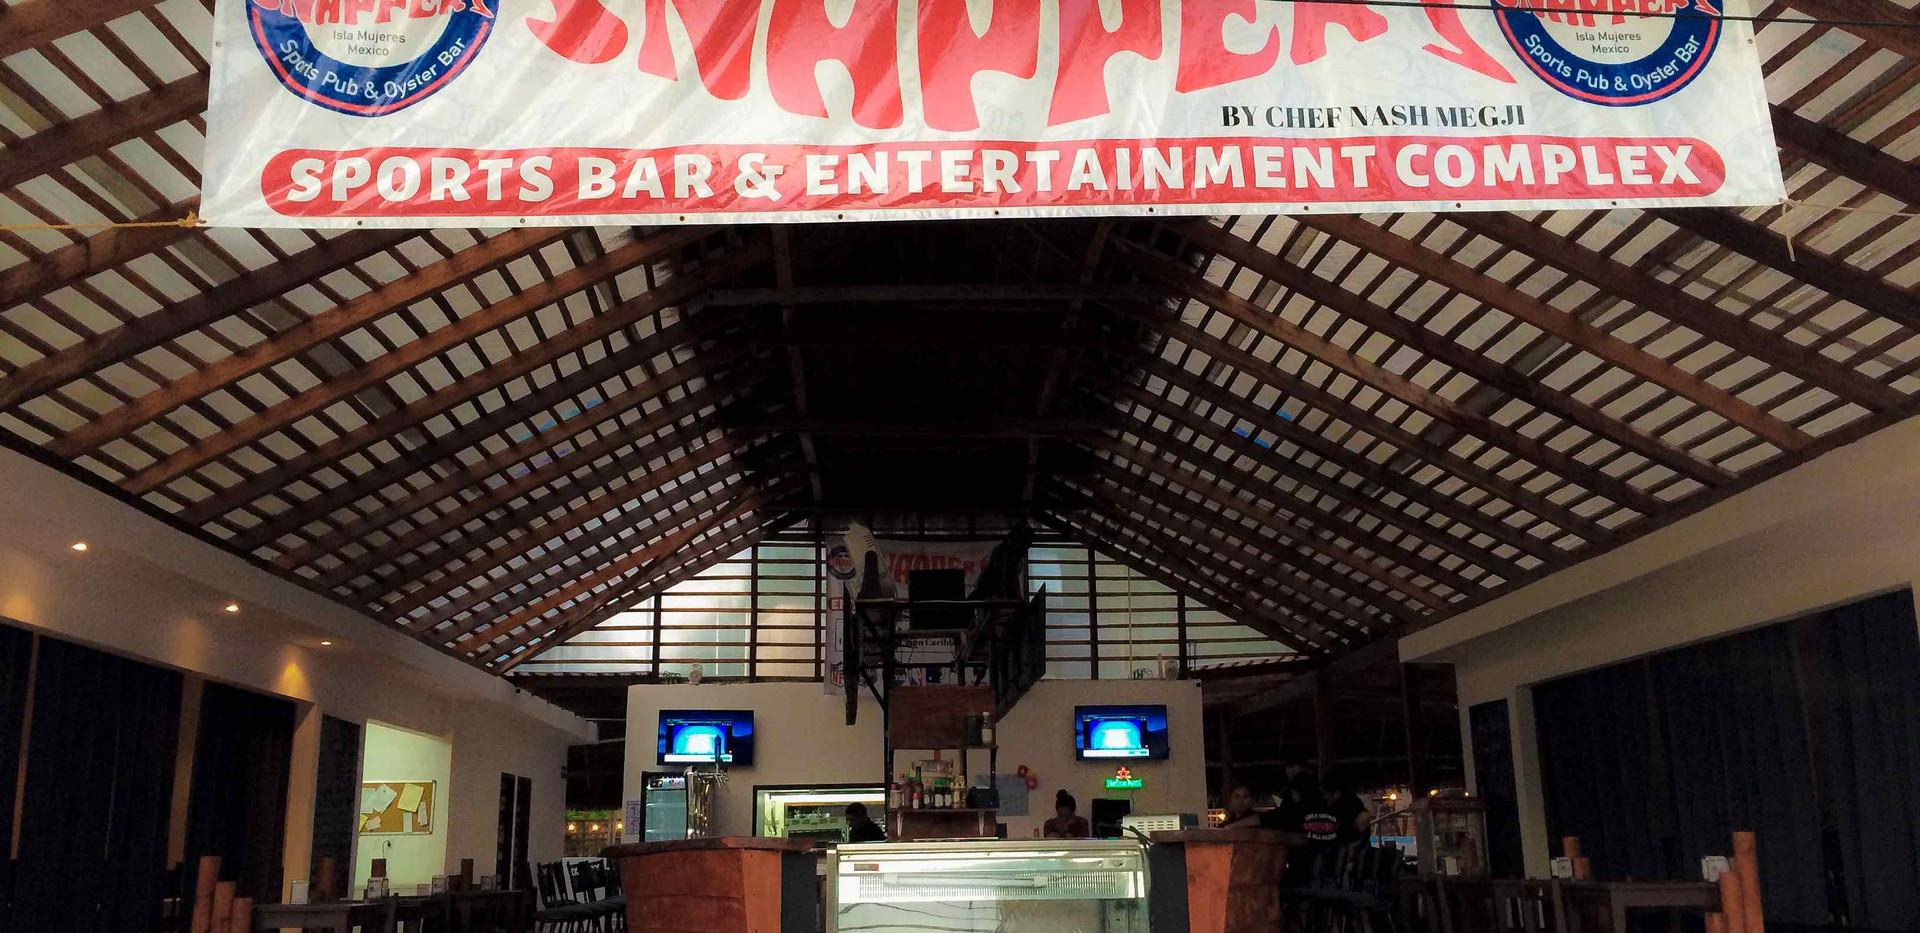 Snapper's